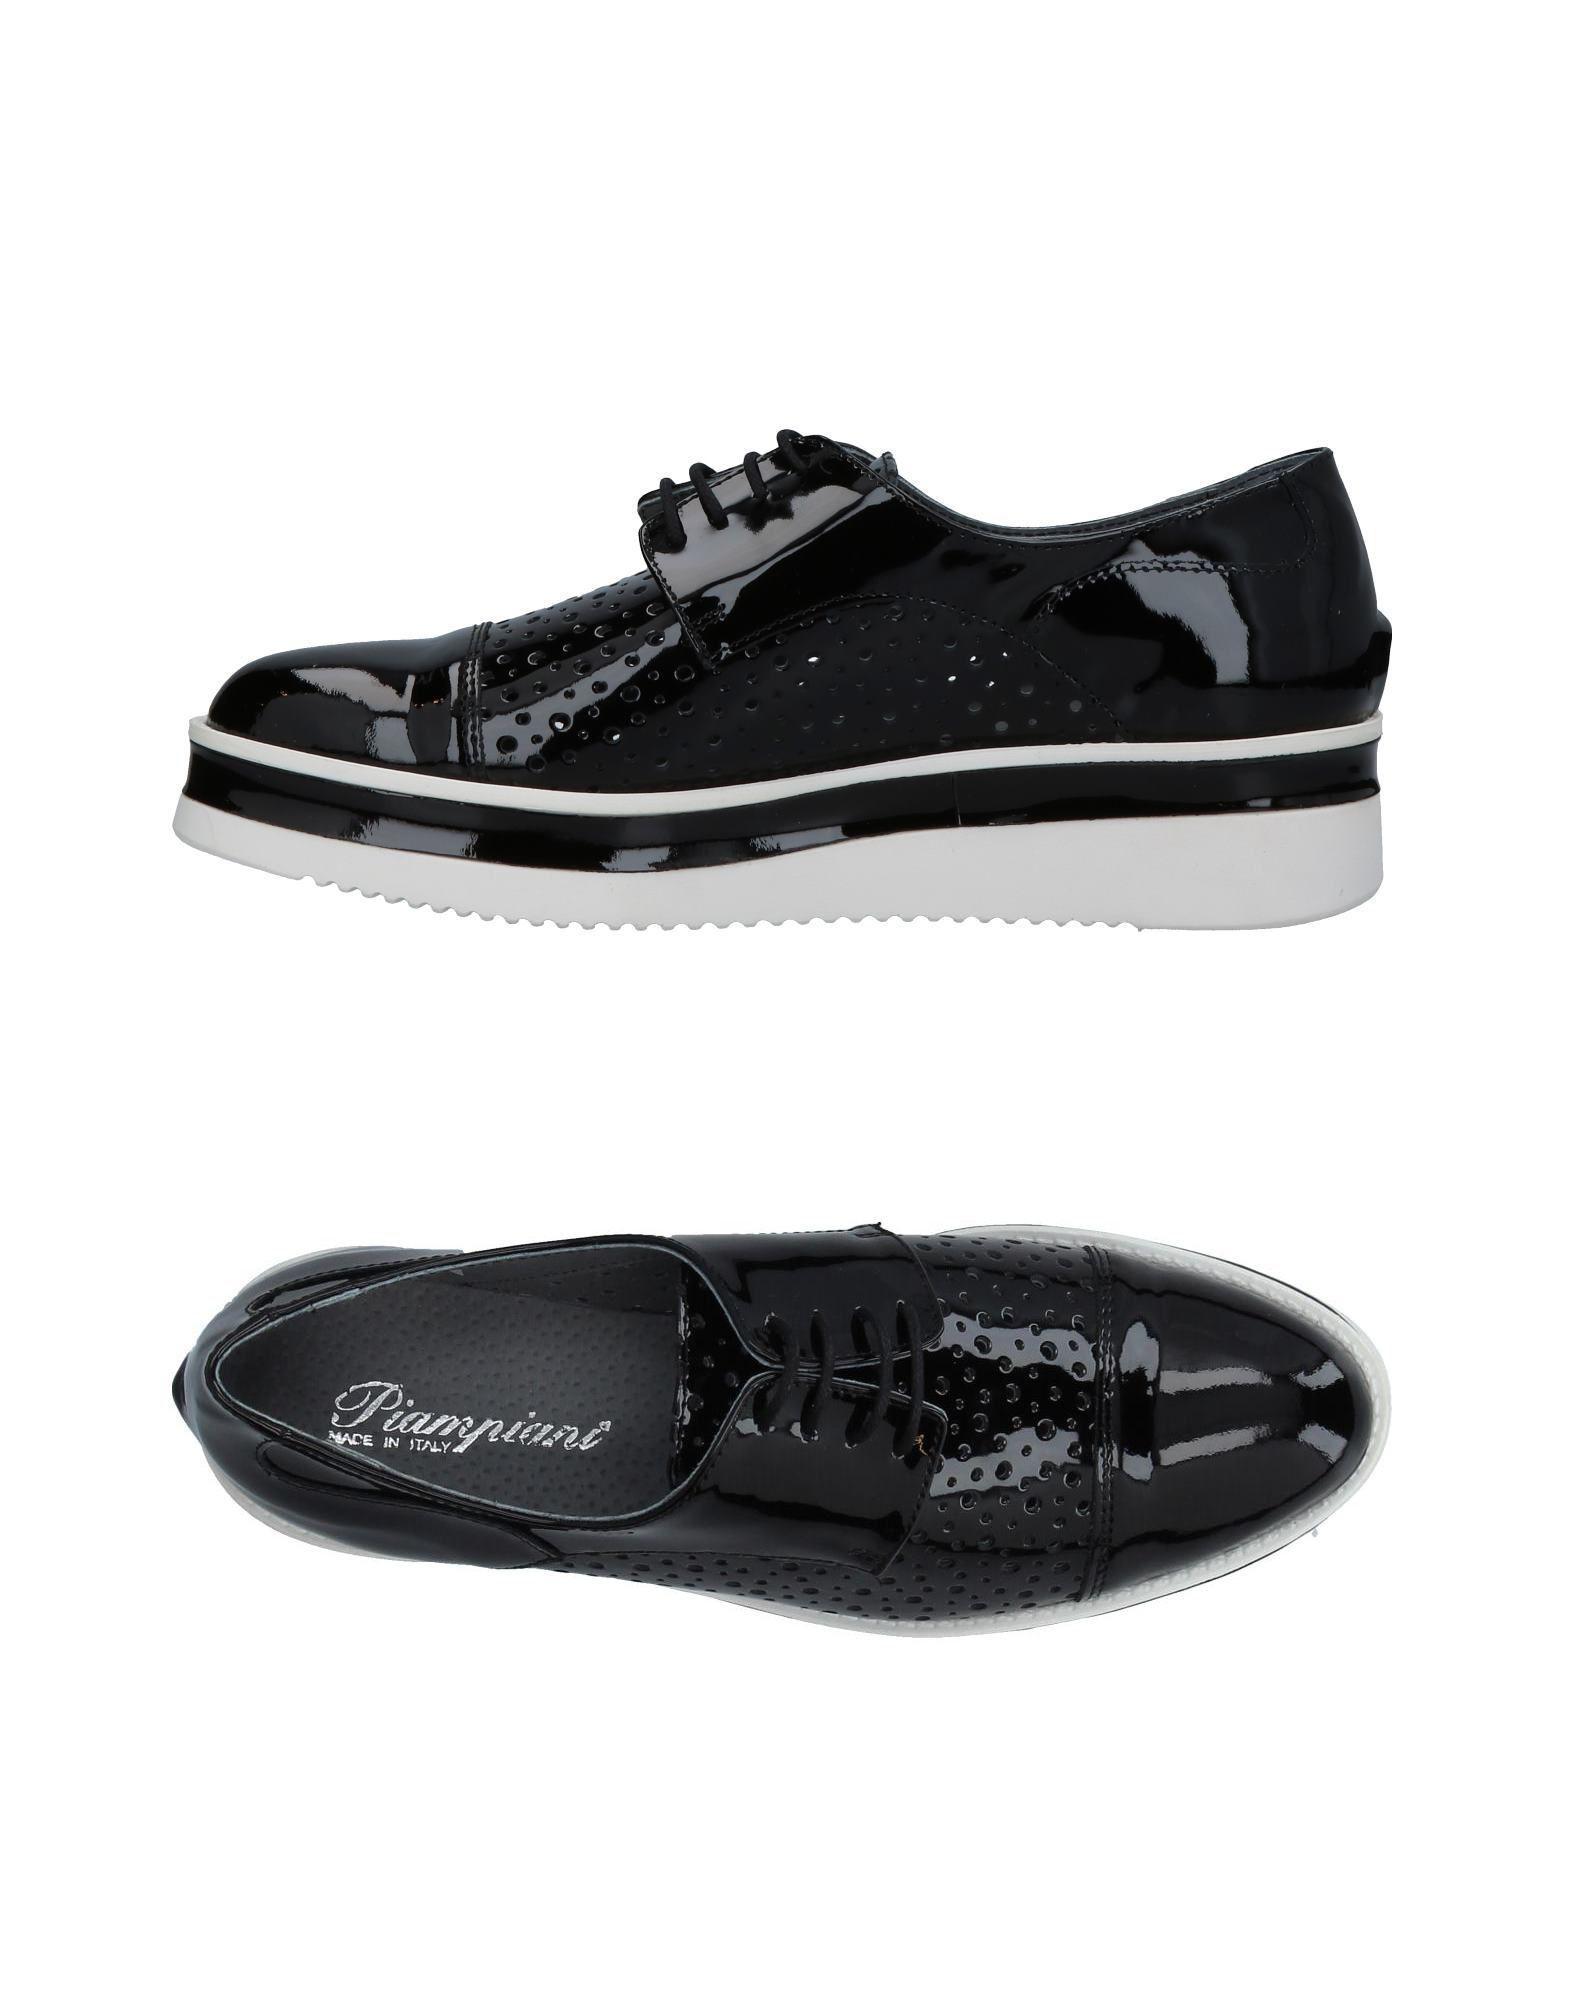 FOOTWEAR - Lace-up shoes Piampiani Fashionable Online s5MouQ7t